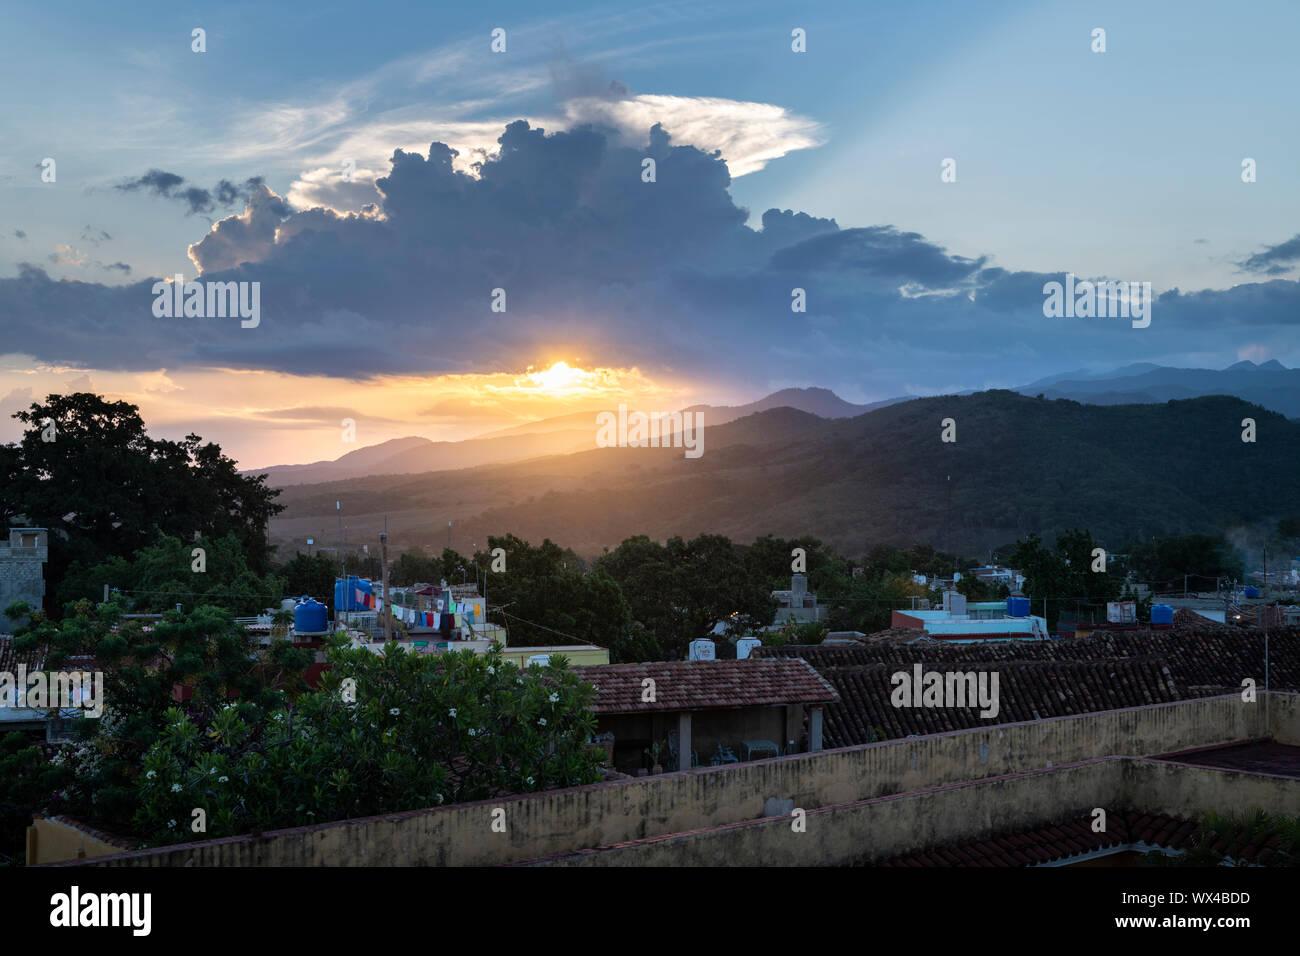 Trinidad, Cuba - colonial town cityscape. UNESCO World Heritage Site. Stock Photo